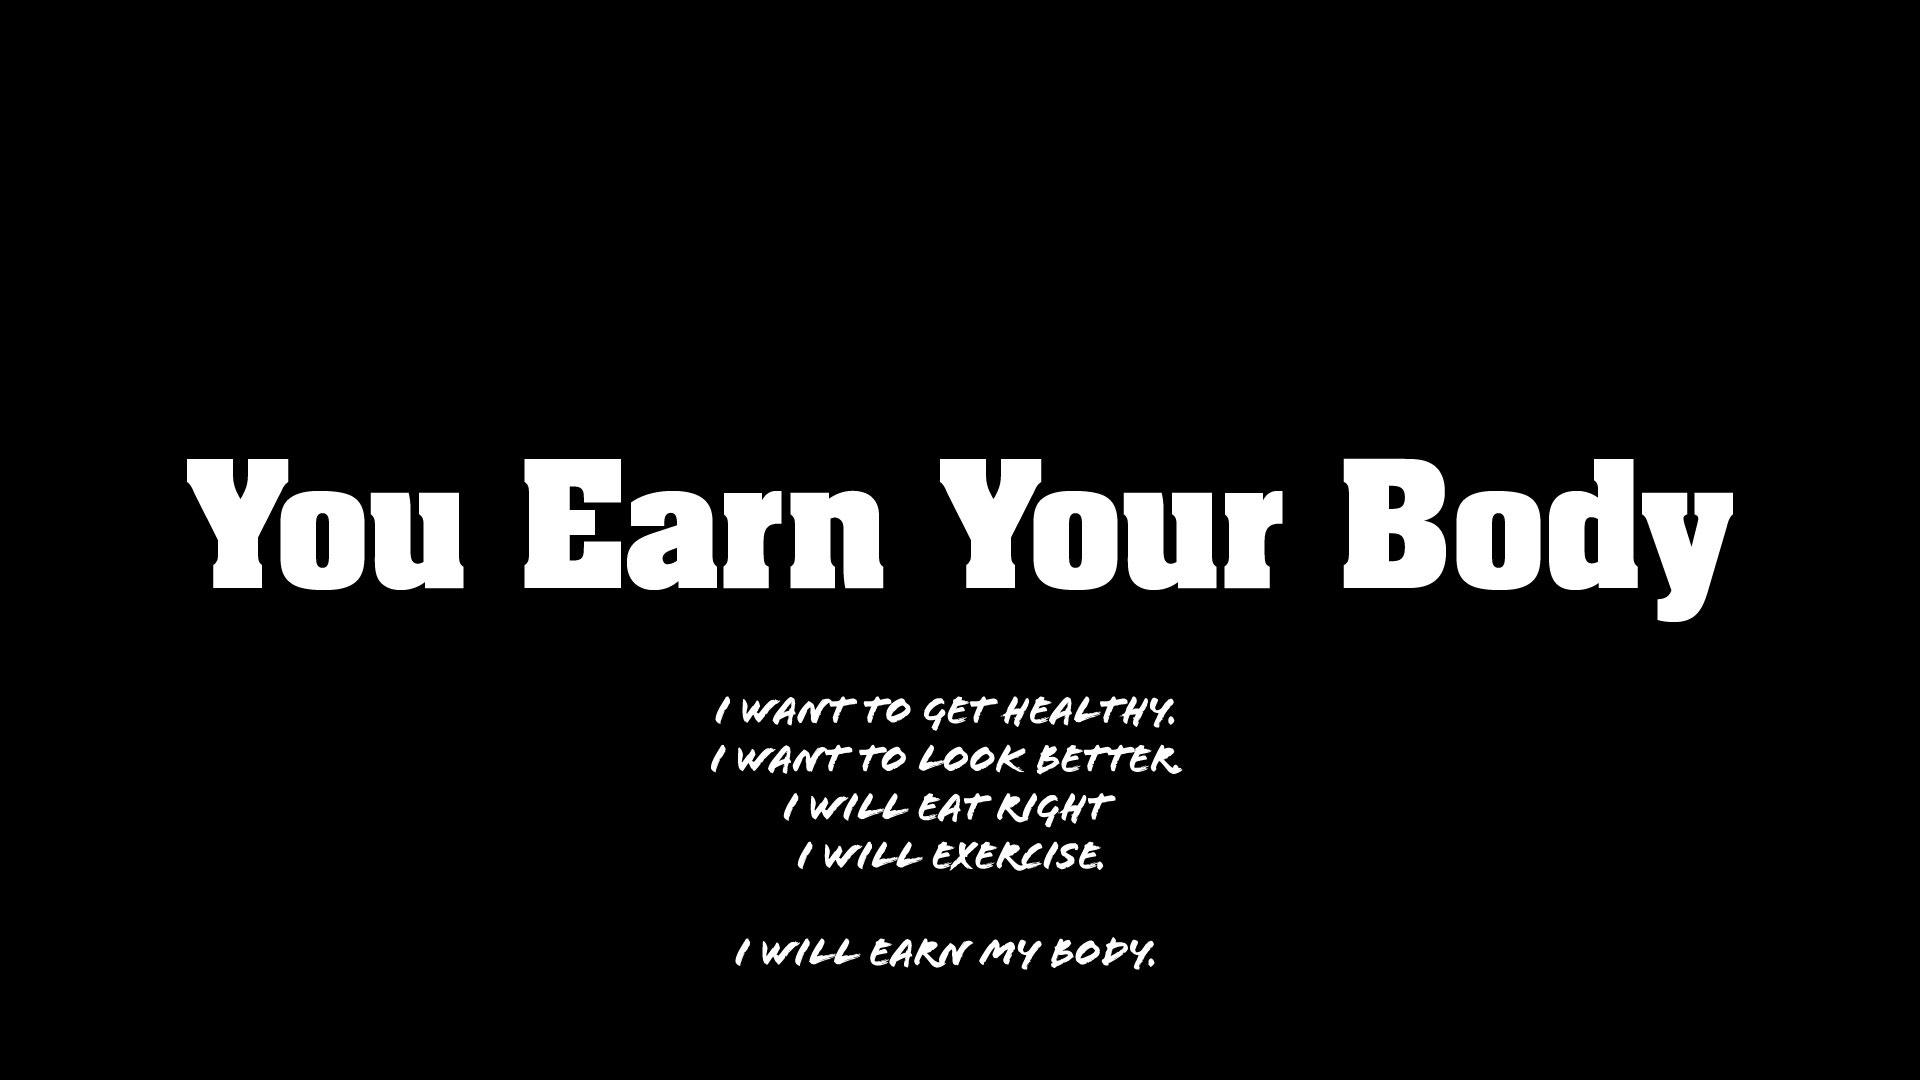 Gym Quotes Wallpaper Hd Workout Motivational Backgrounds Pixelstalk Net